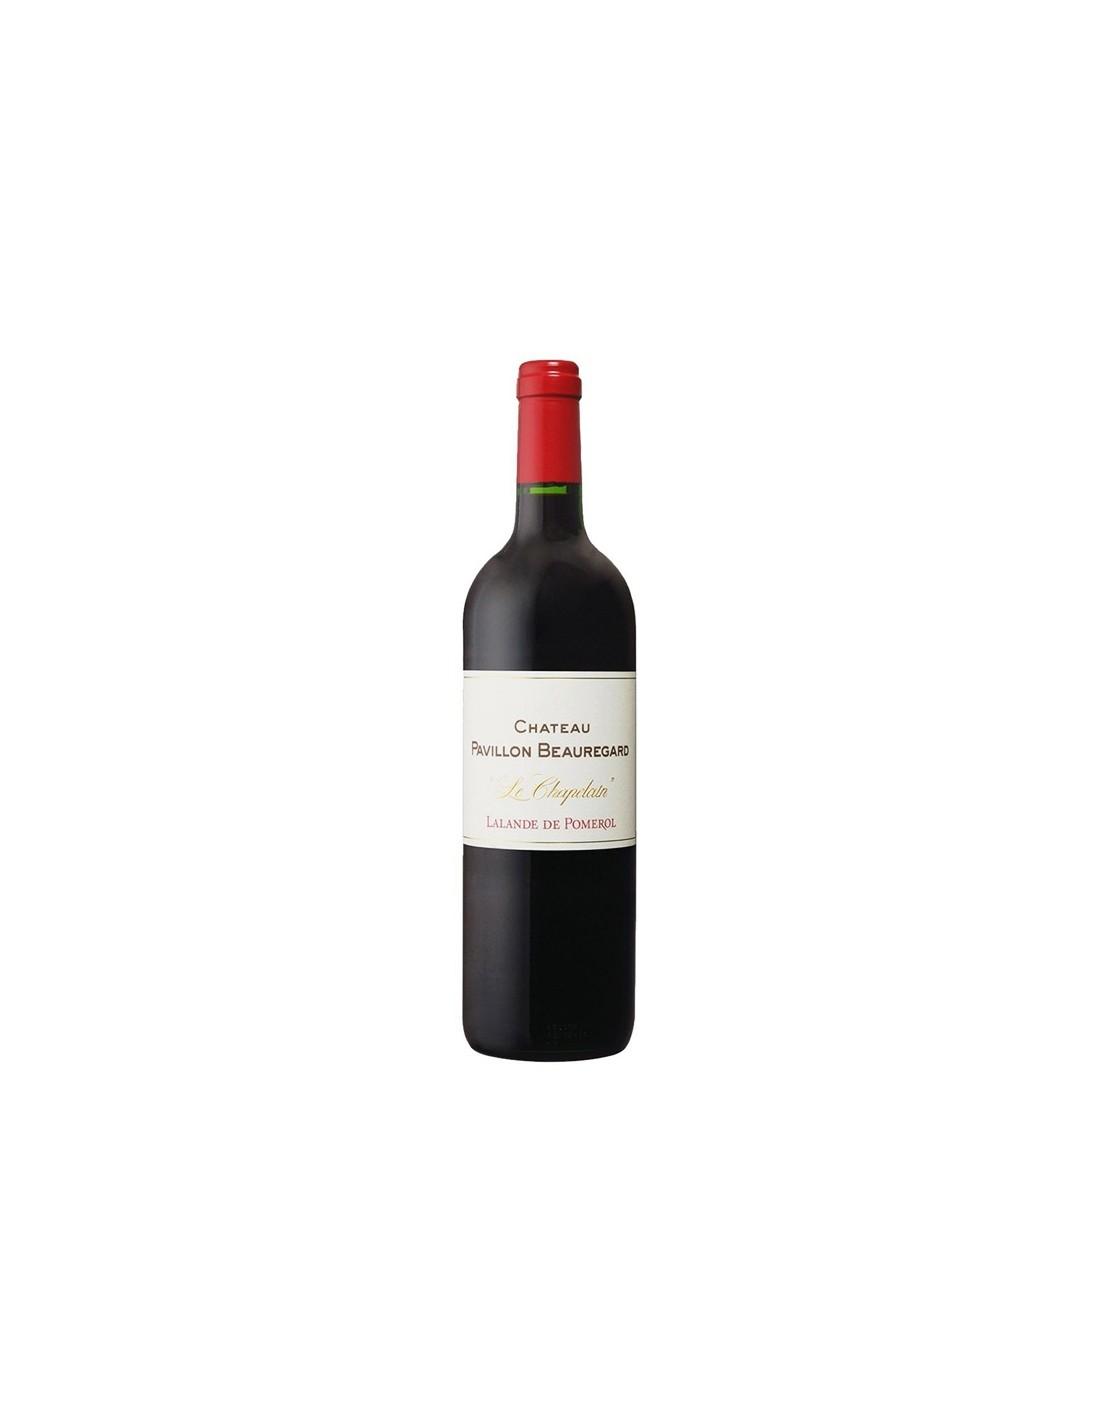 Vin rosu, Cupaj, Château Pavillon Beauregard Lalande-de-Pomerol, 0.75L, Franta